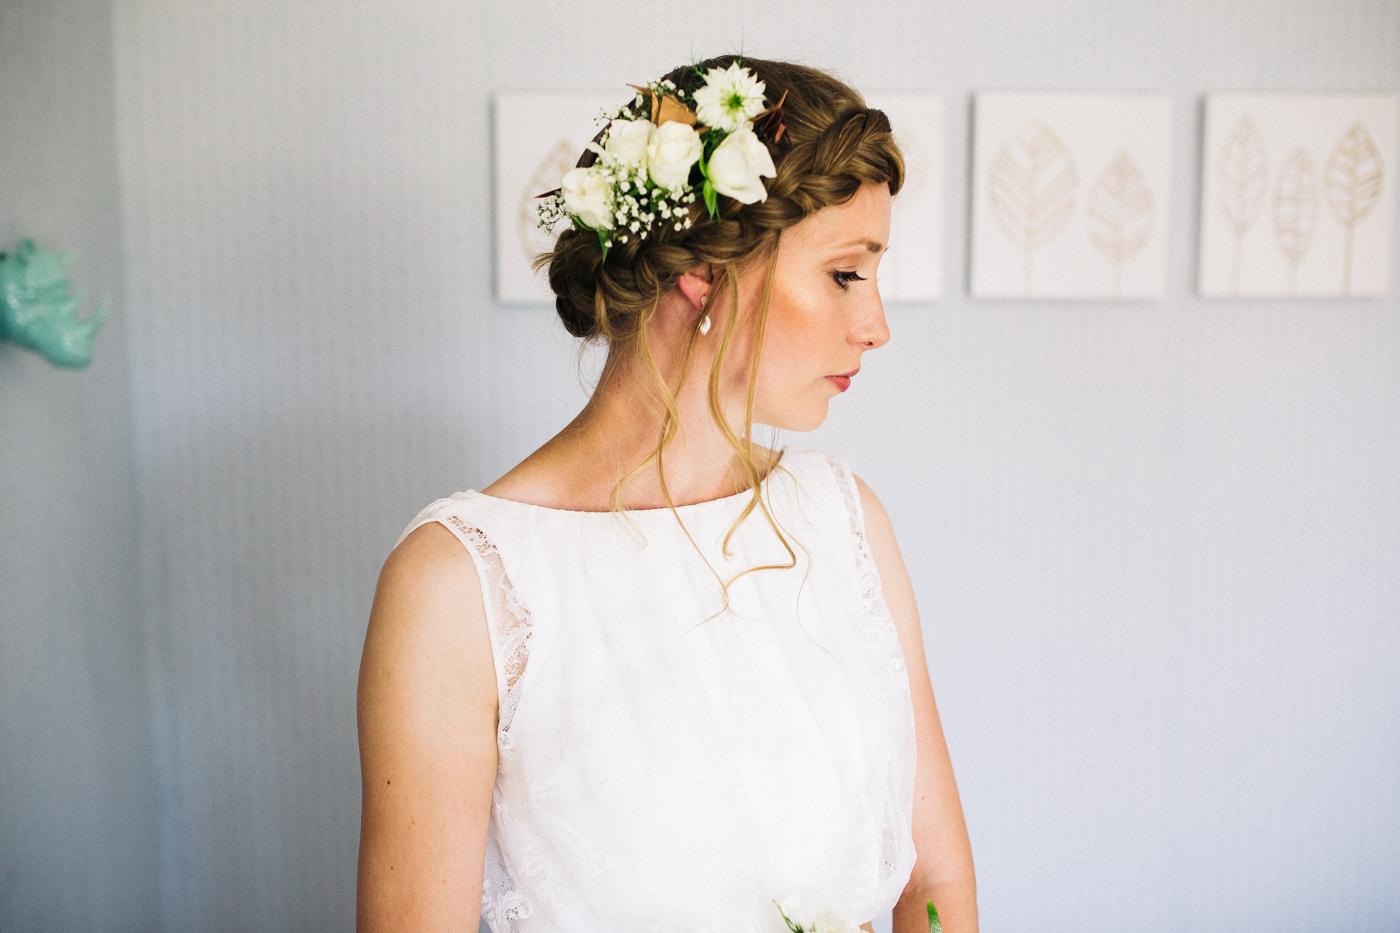 teesside-middlesbrough-north-east-wedding-photographer-creative-wedding-venues-0025.jpg